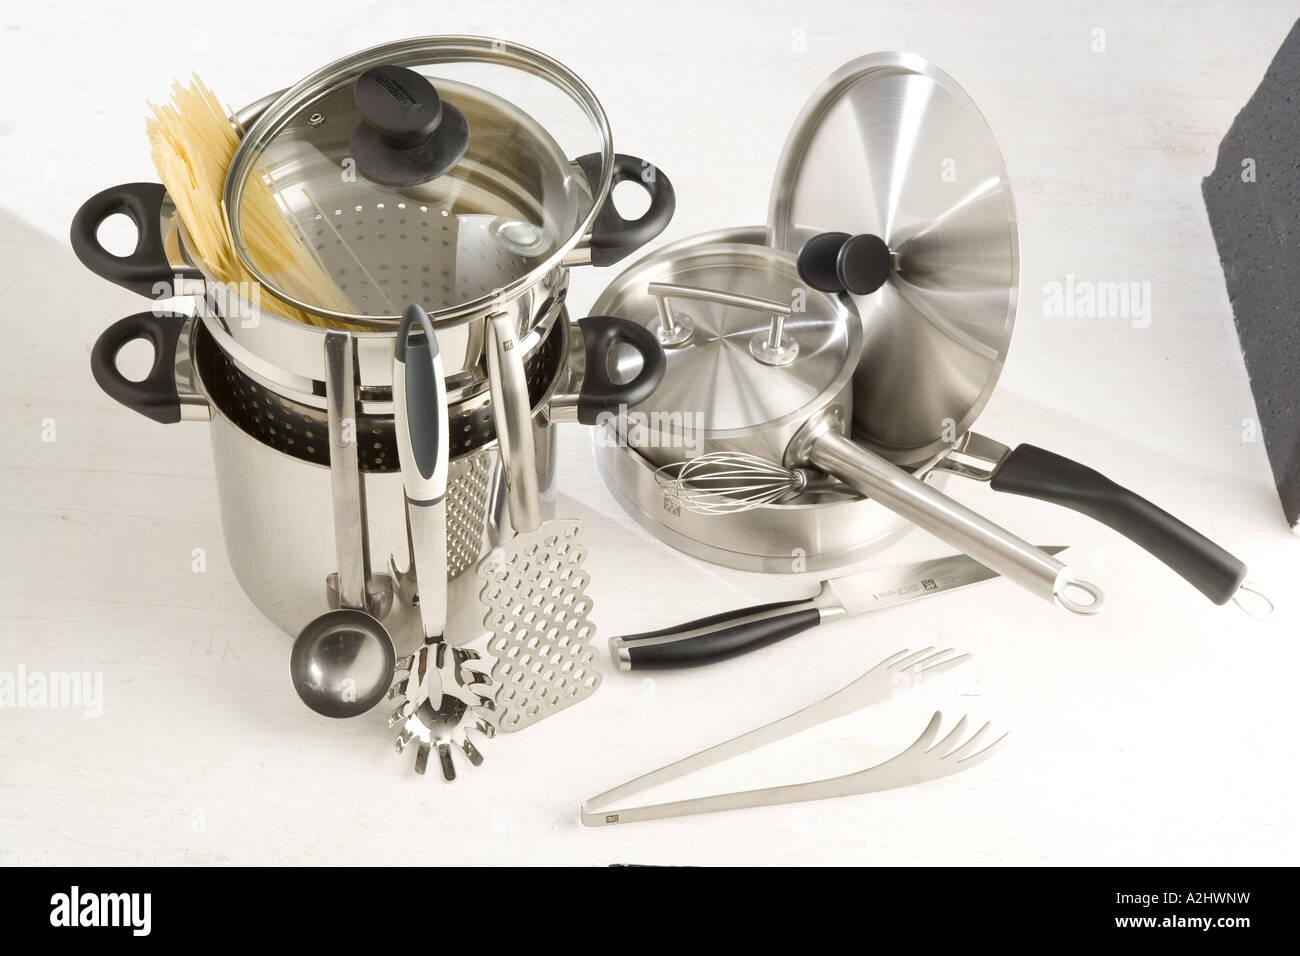 Kitchenwares   Stock Image